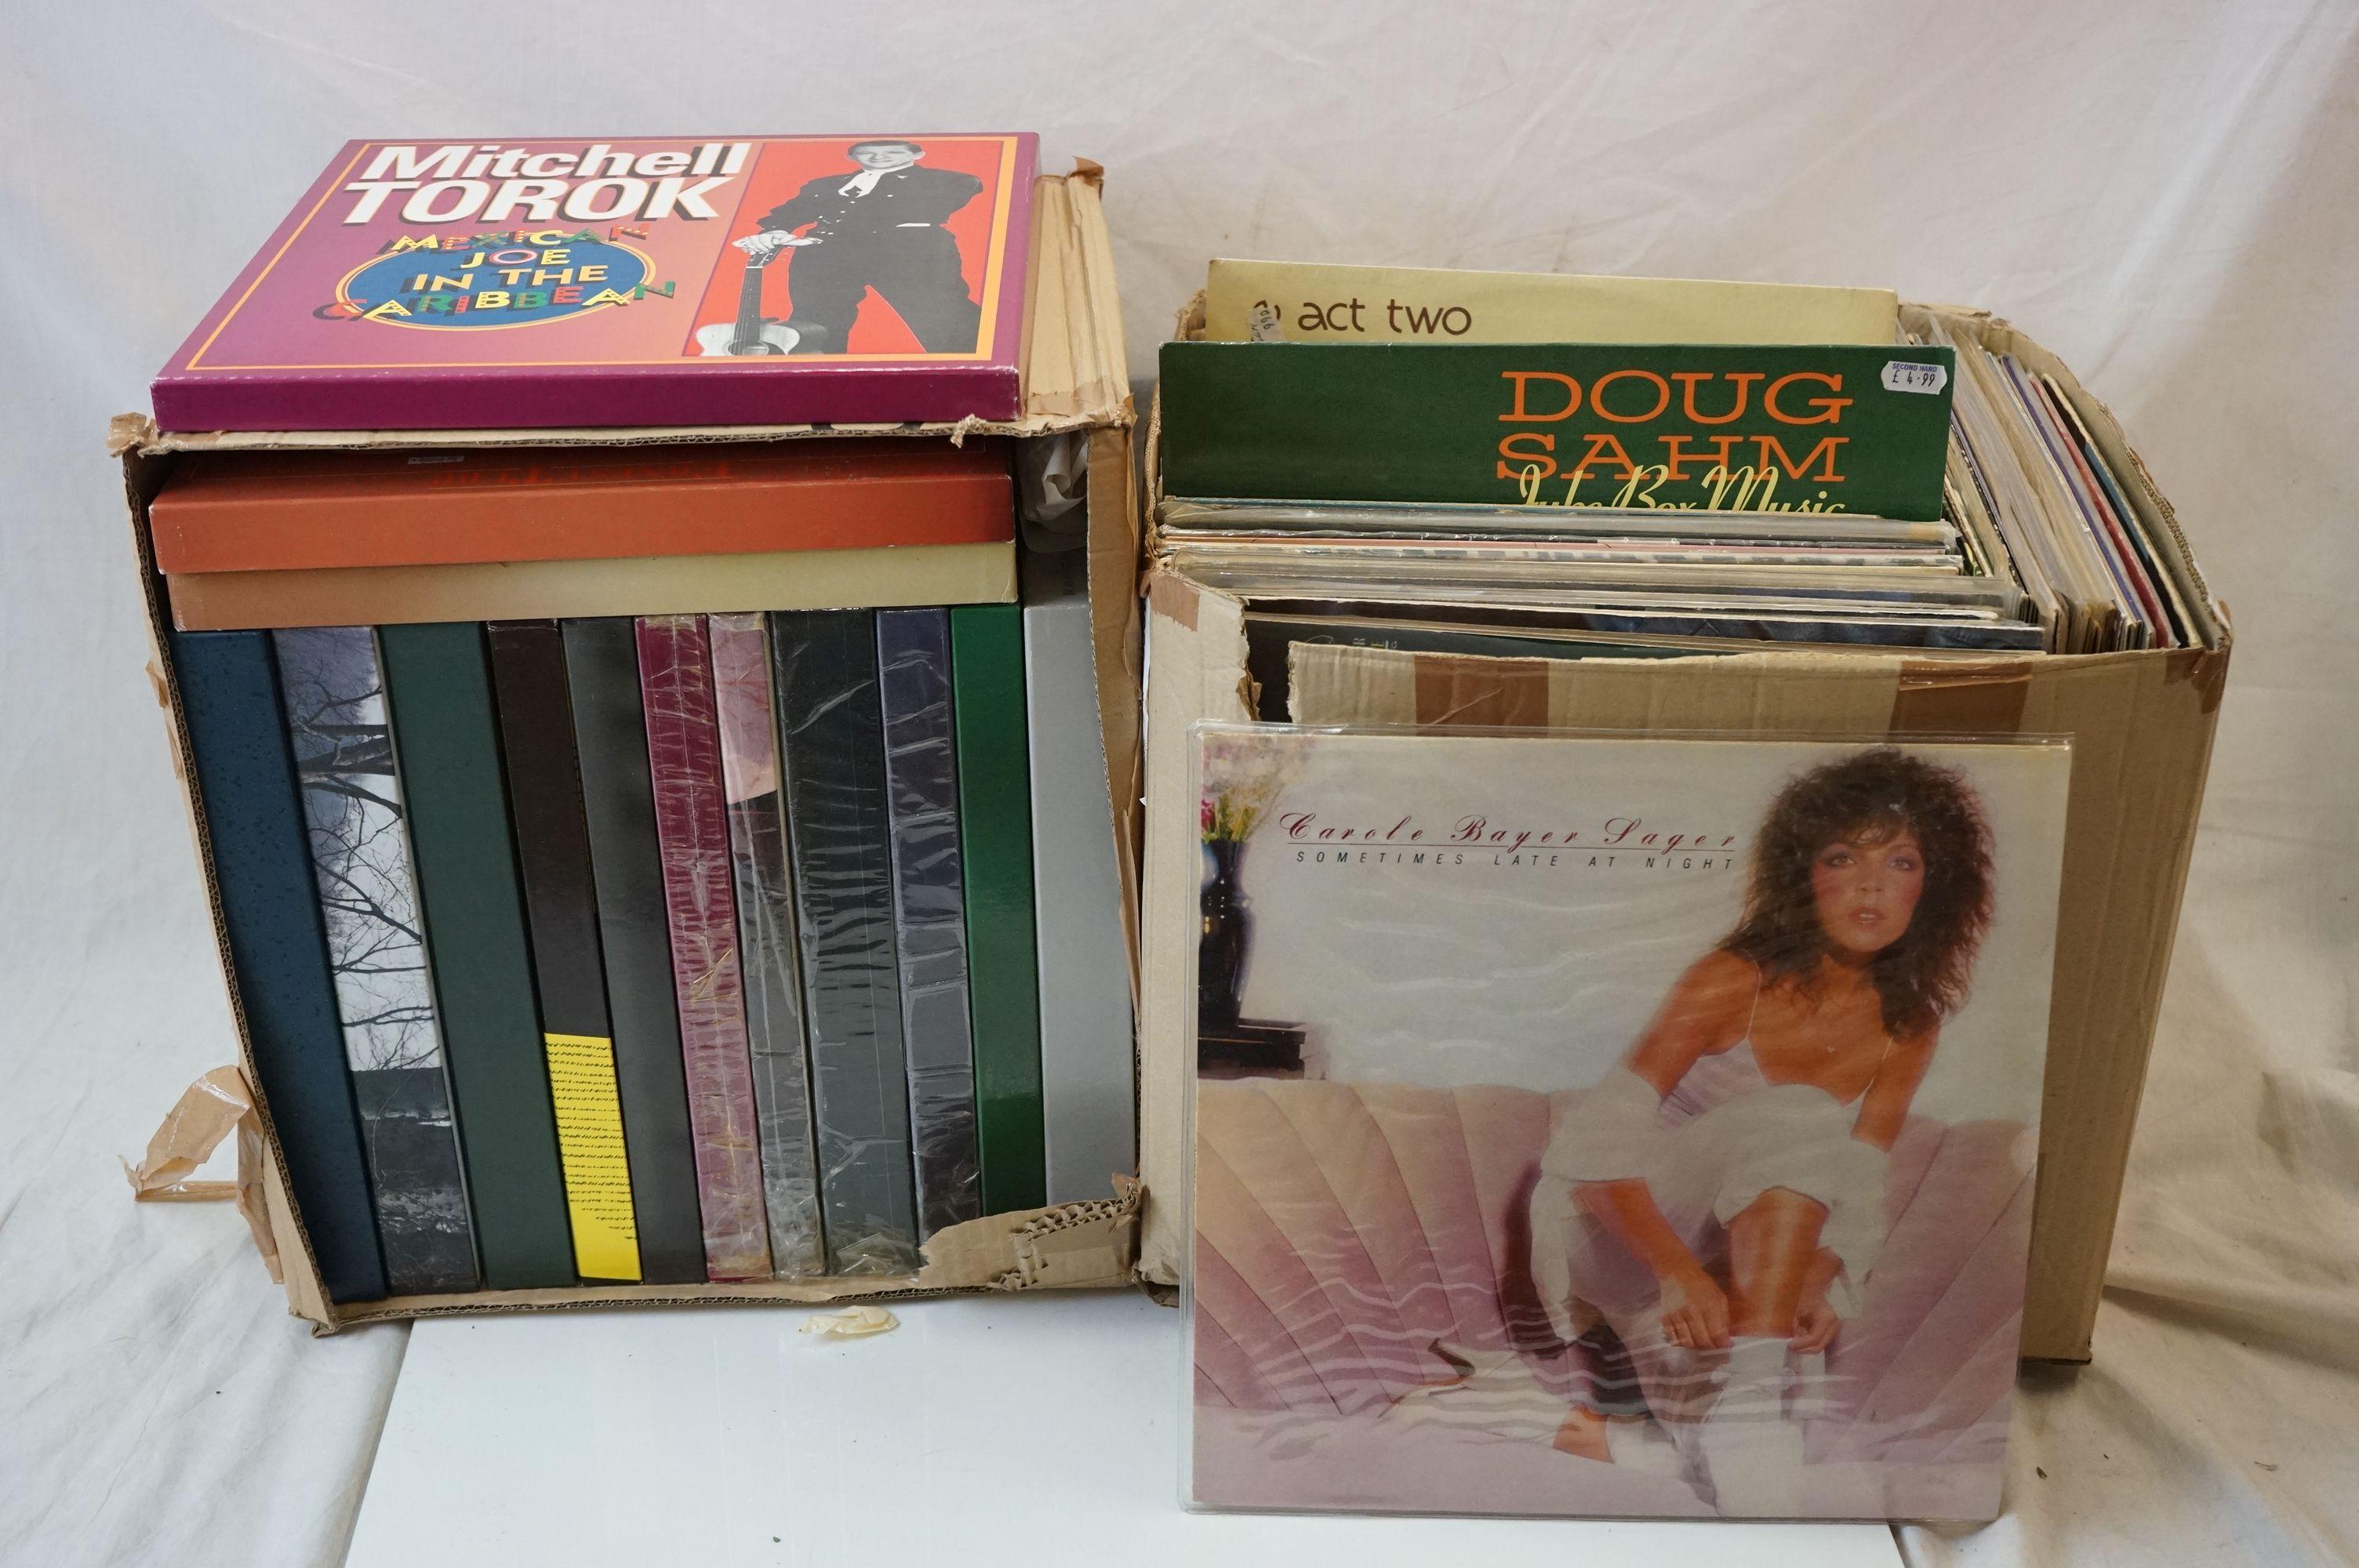 Vinyl - Around 130 LPs and 14 Box Sets to include Charlie Wiseman, Mac Wiseman, Slim Whitman etc (